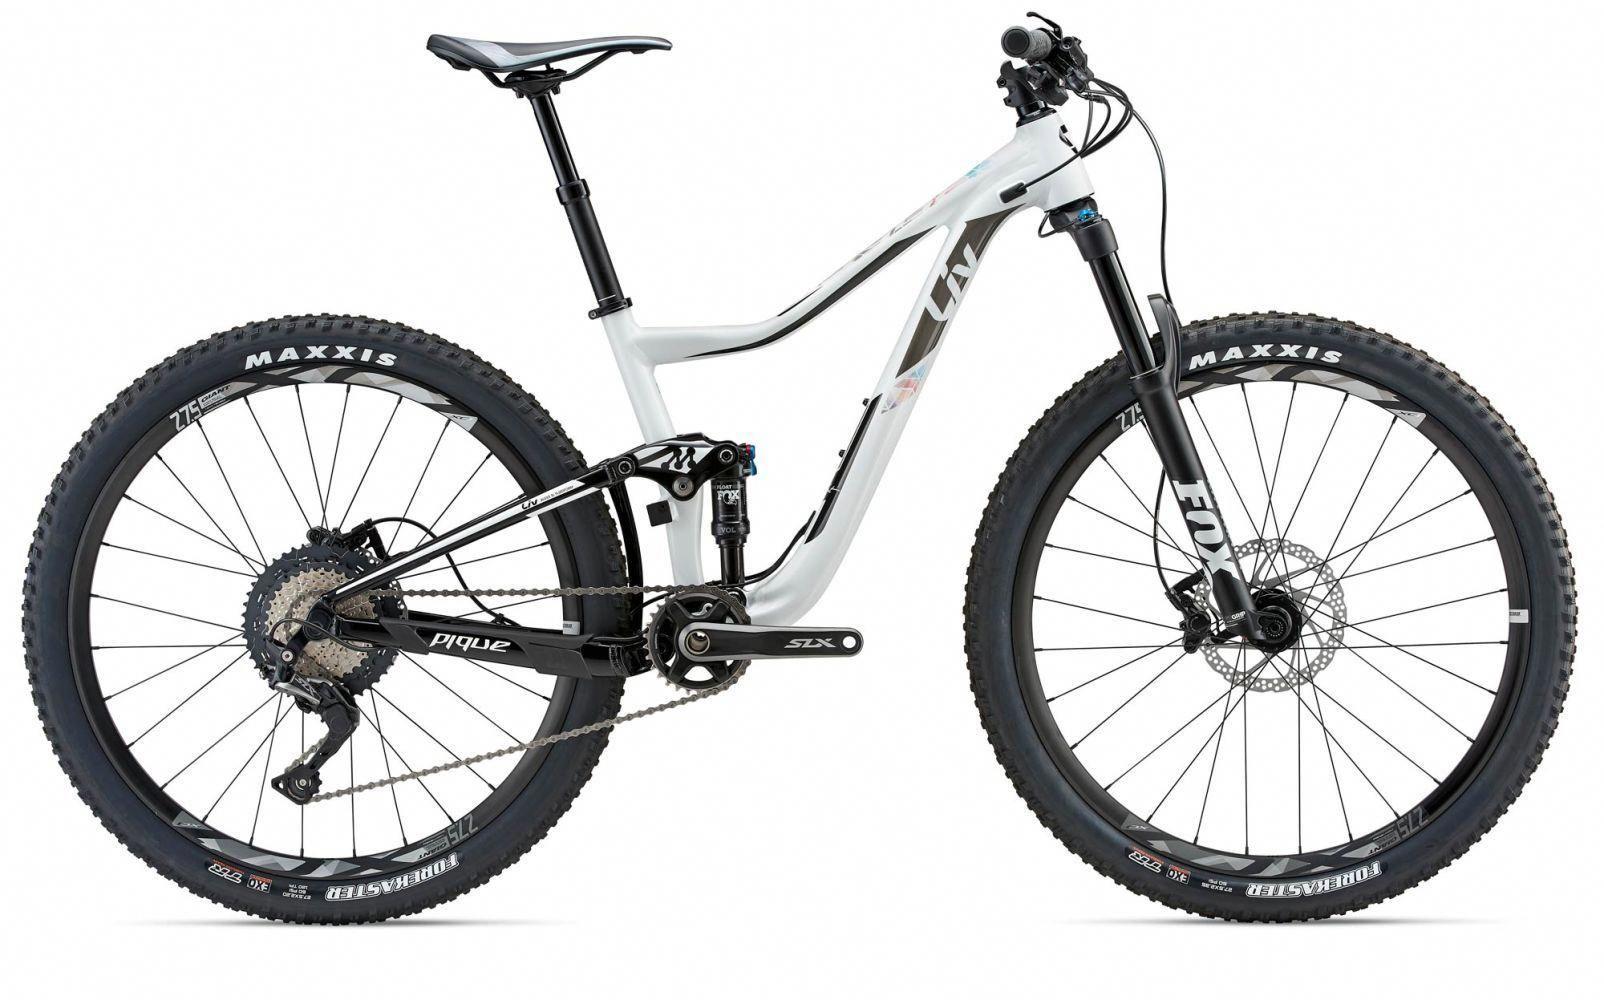 Types Of Bikes With Images Folding Mountain Bike Mountain